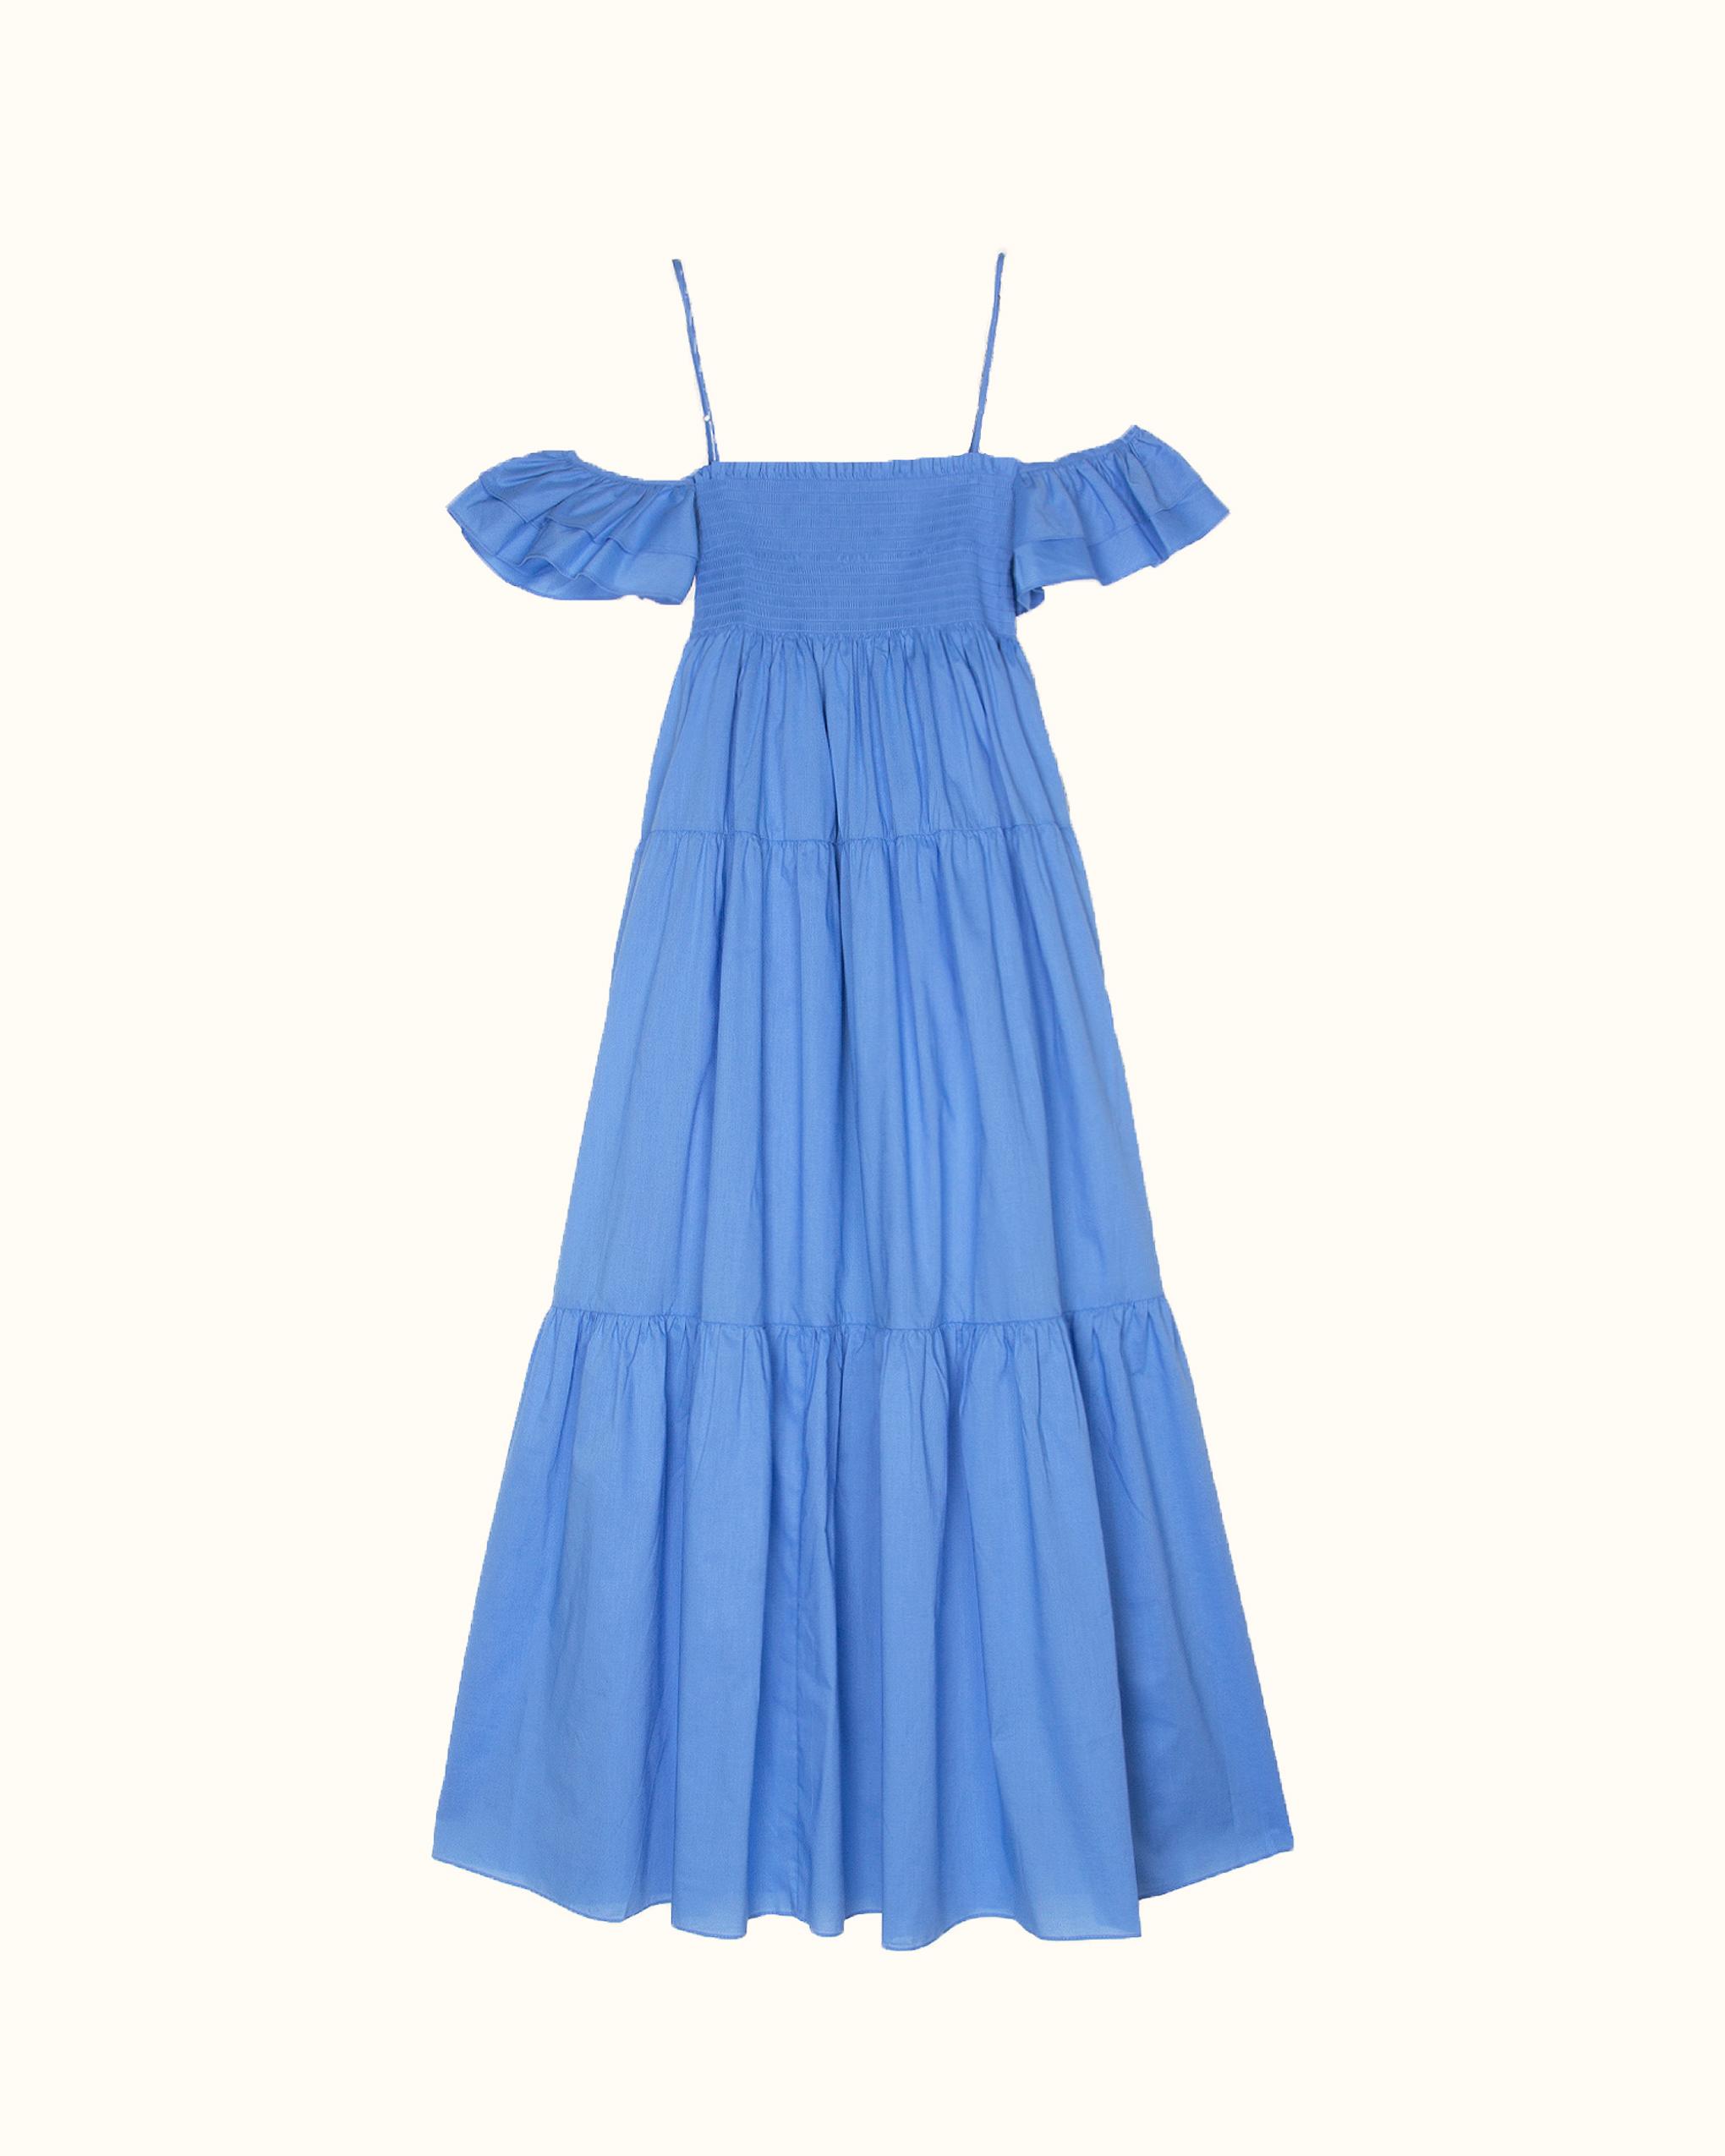 A blue ruffle off-the-shoulder dress.